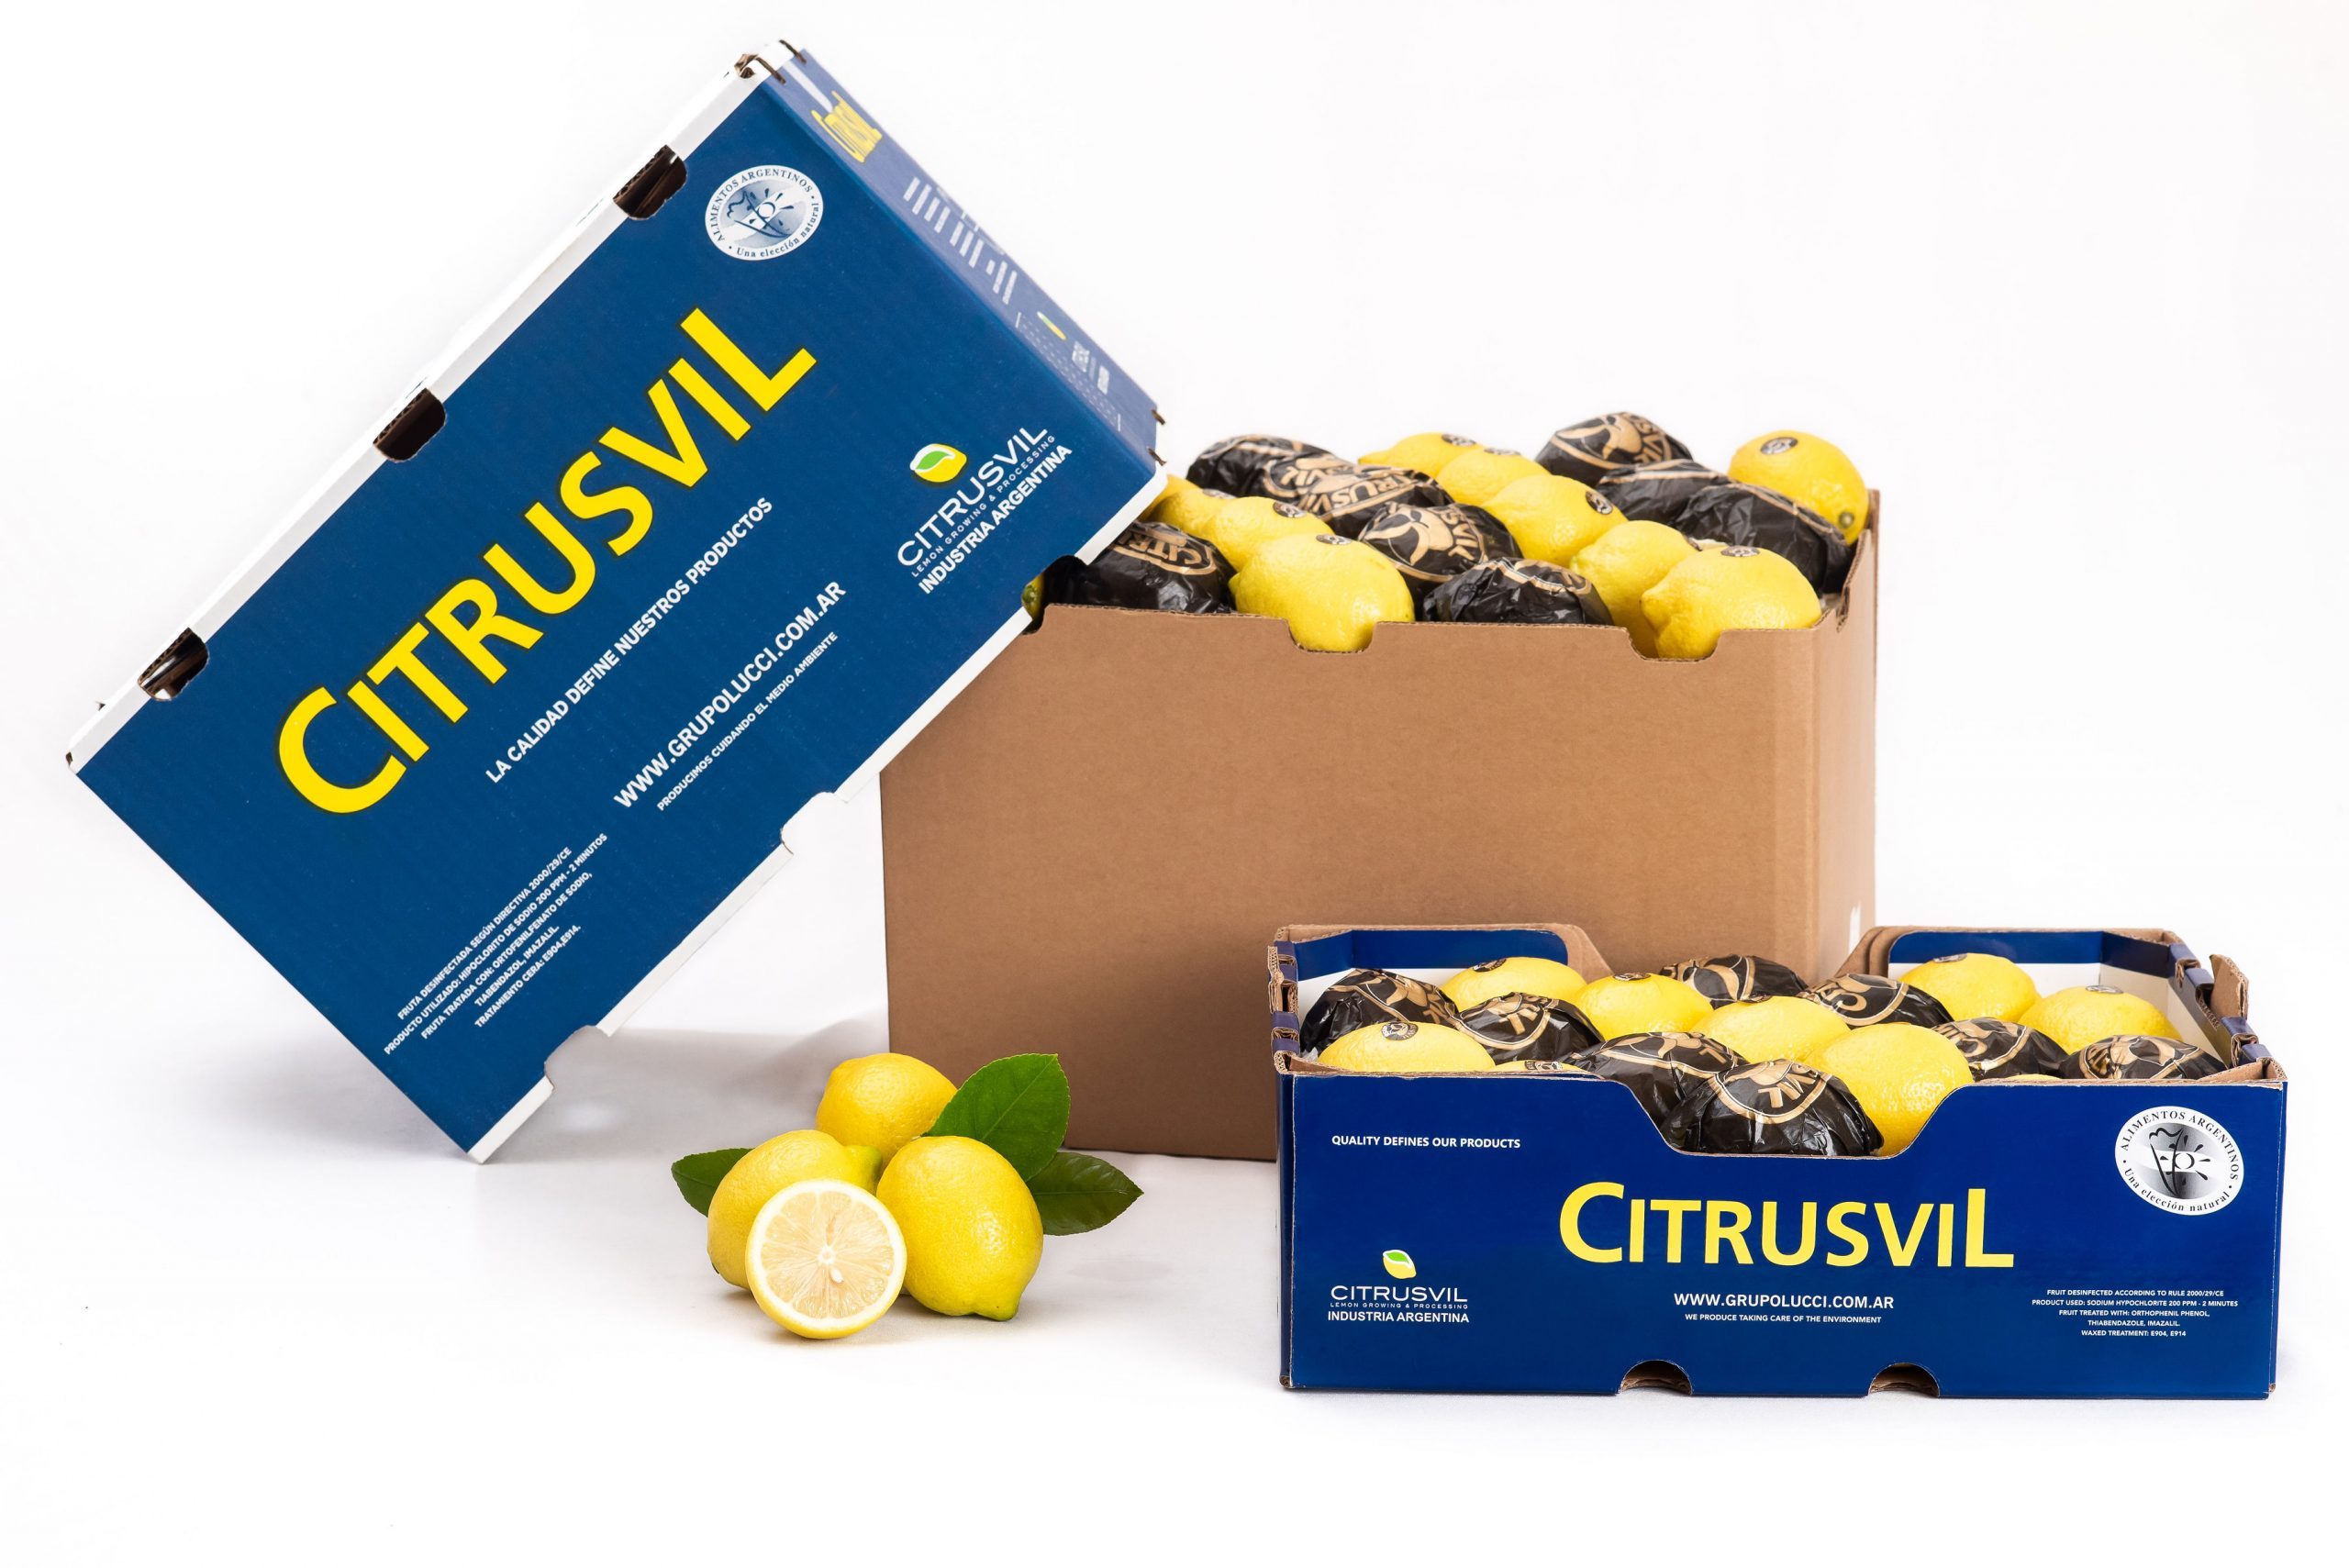 Citrusvil's campaign progresses at a steady pace